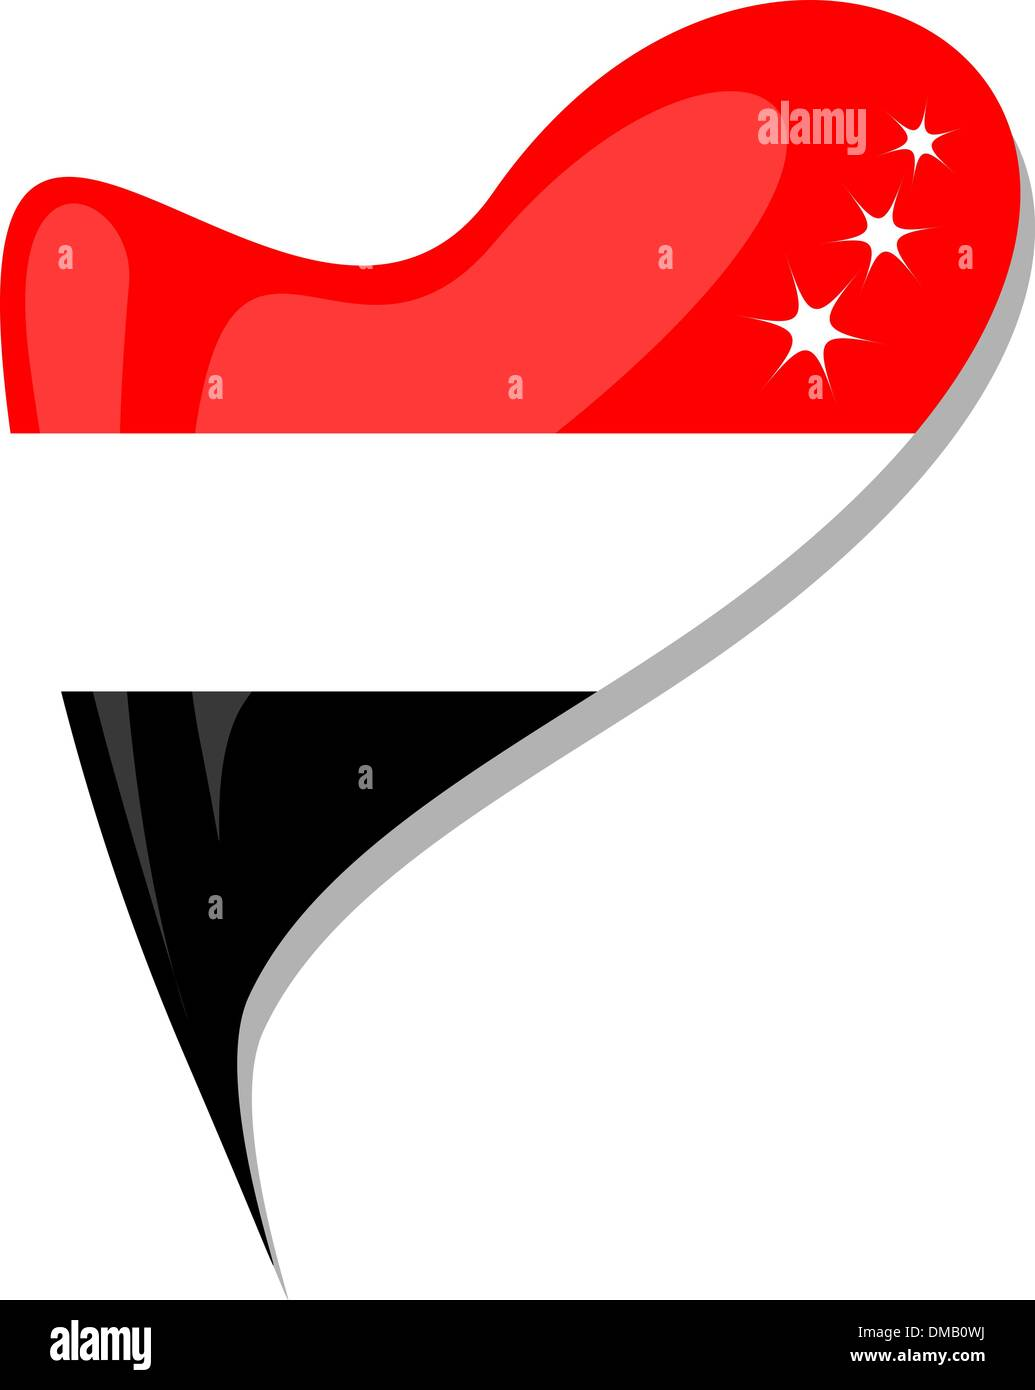 yemen flag button heart shape. vector - Stock Image